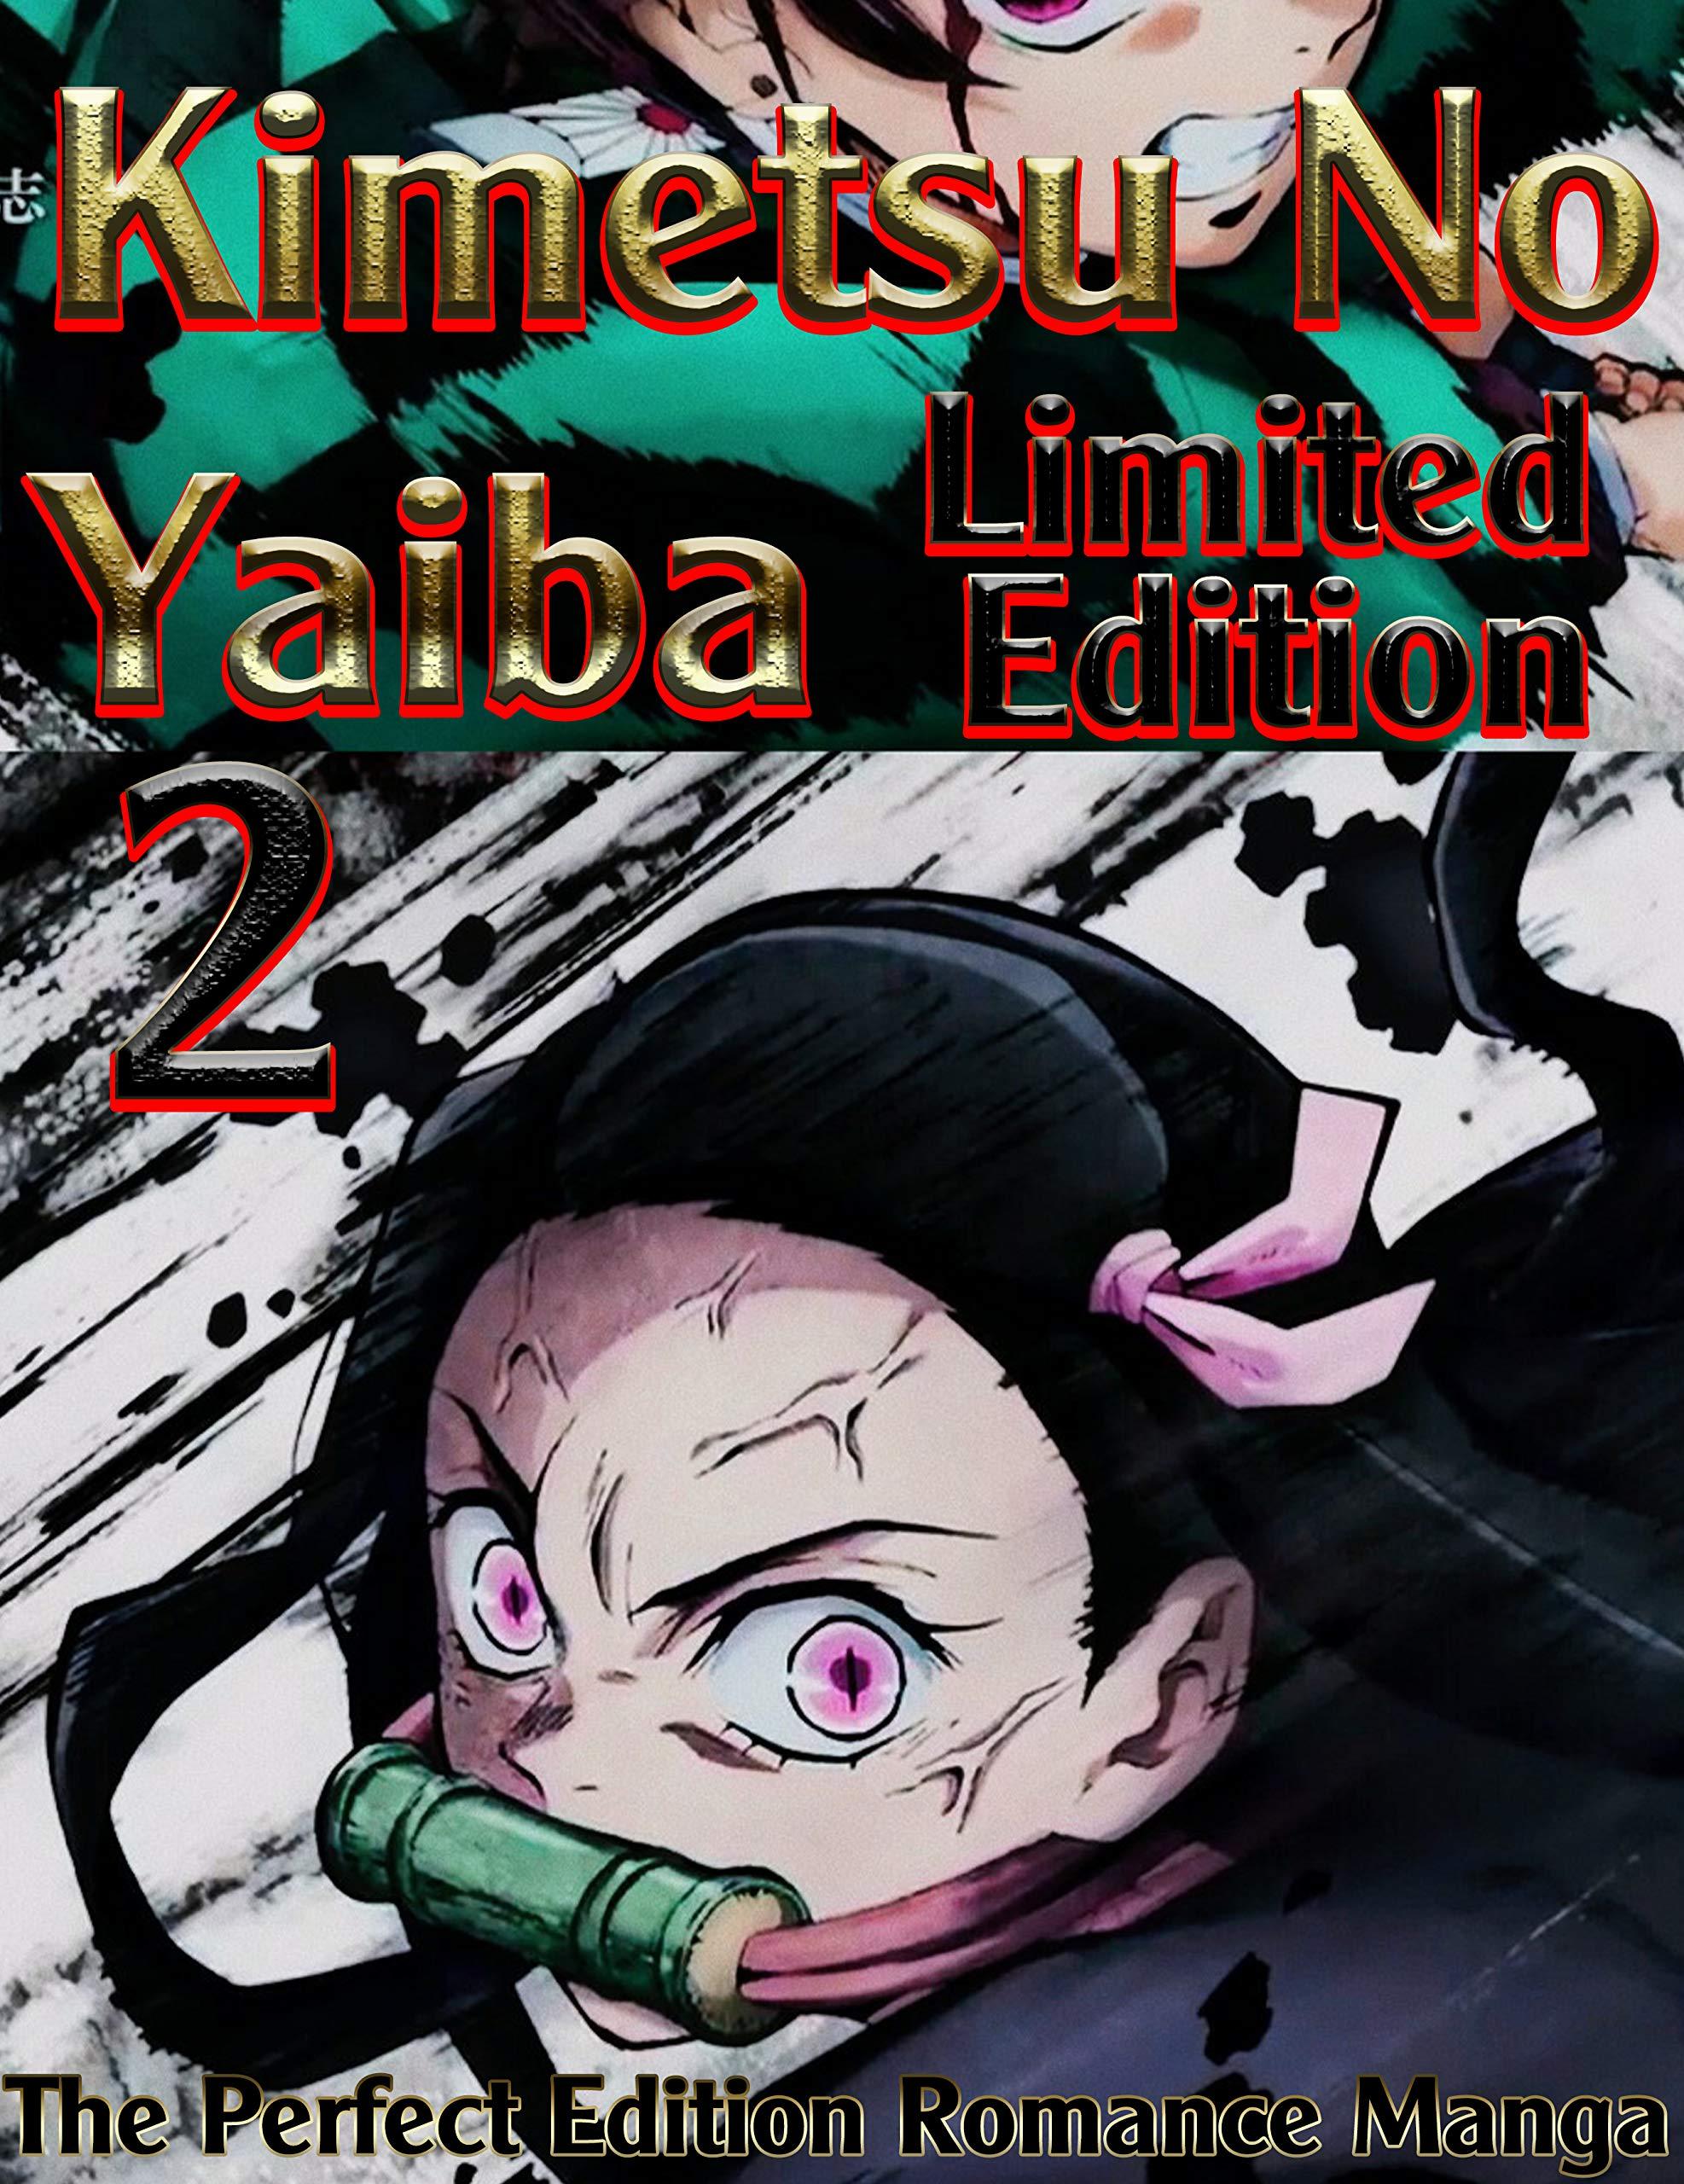 The Perfect Edition Romance Manga Kimetsu No Yaiba Limited Edition: Complete Series Kimetsu No Yaiba Volume 2